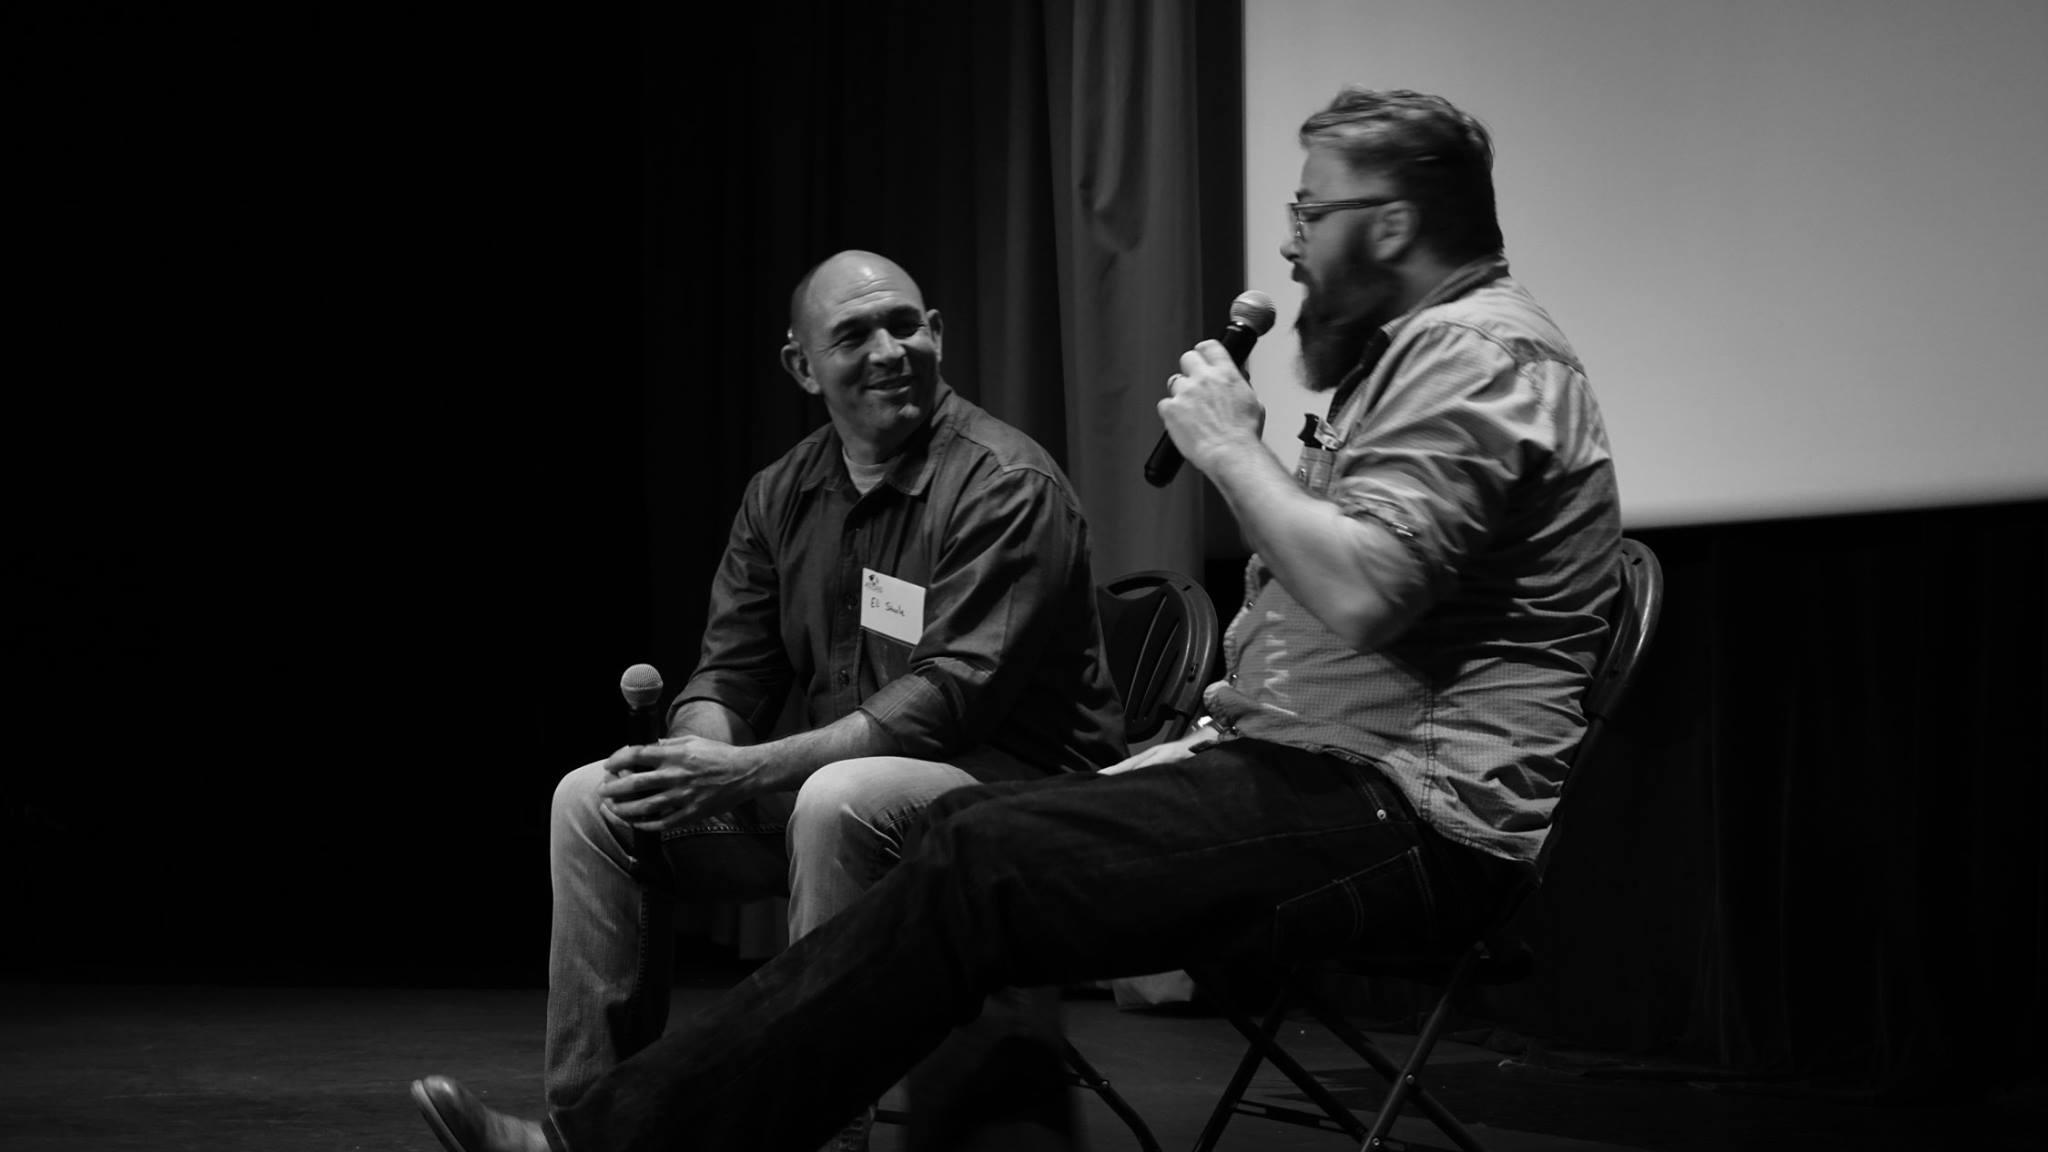 Filmmaker Eli Steele at a post-screening Q & A.